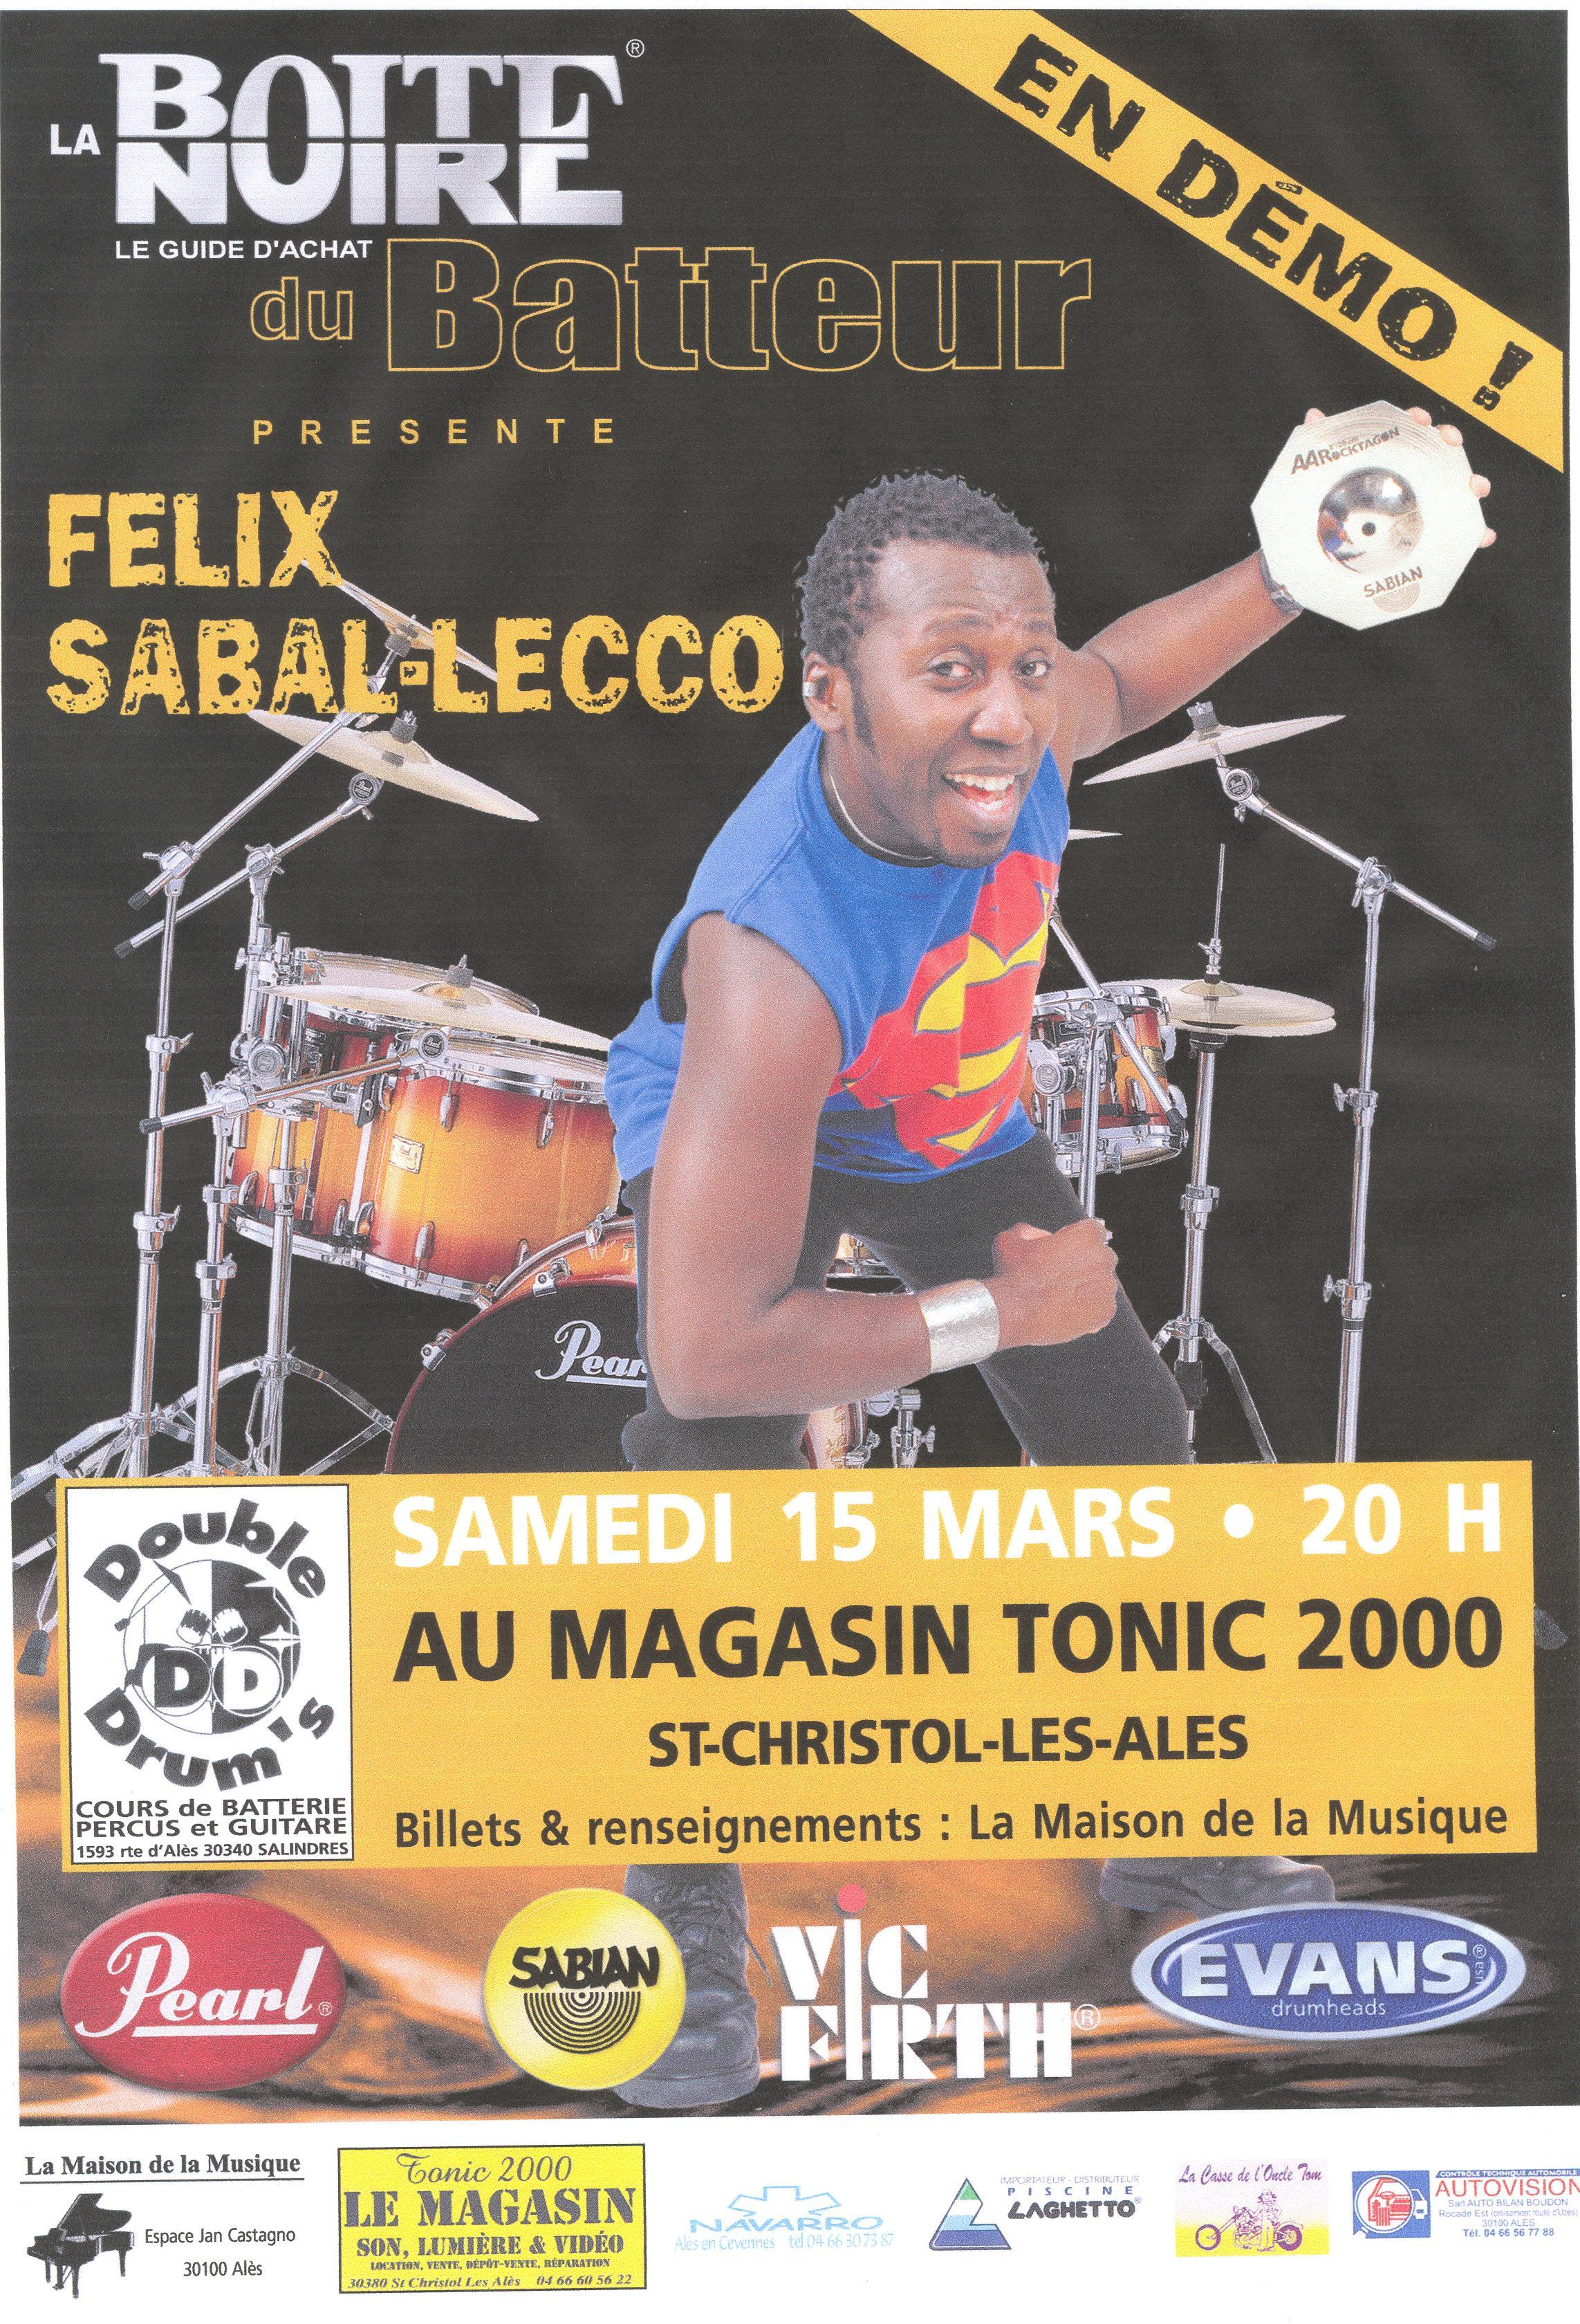 Félix Sabal Lecco 2003